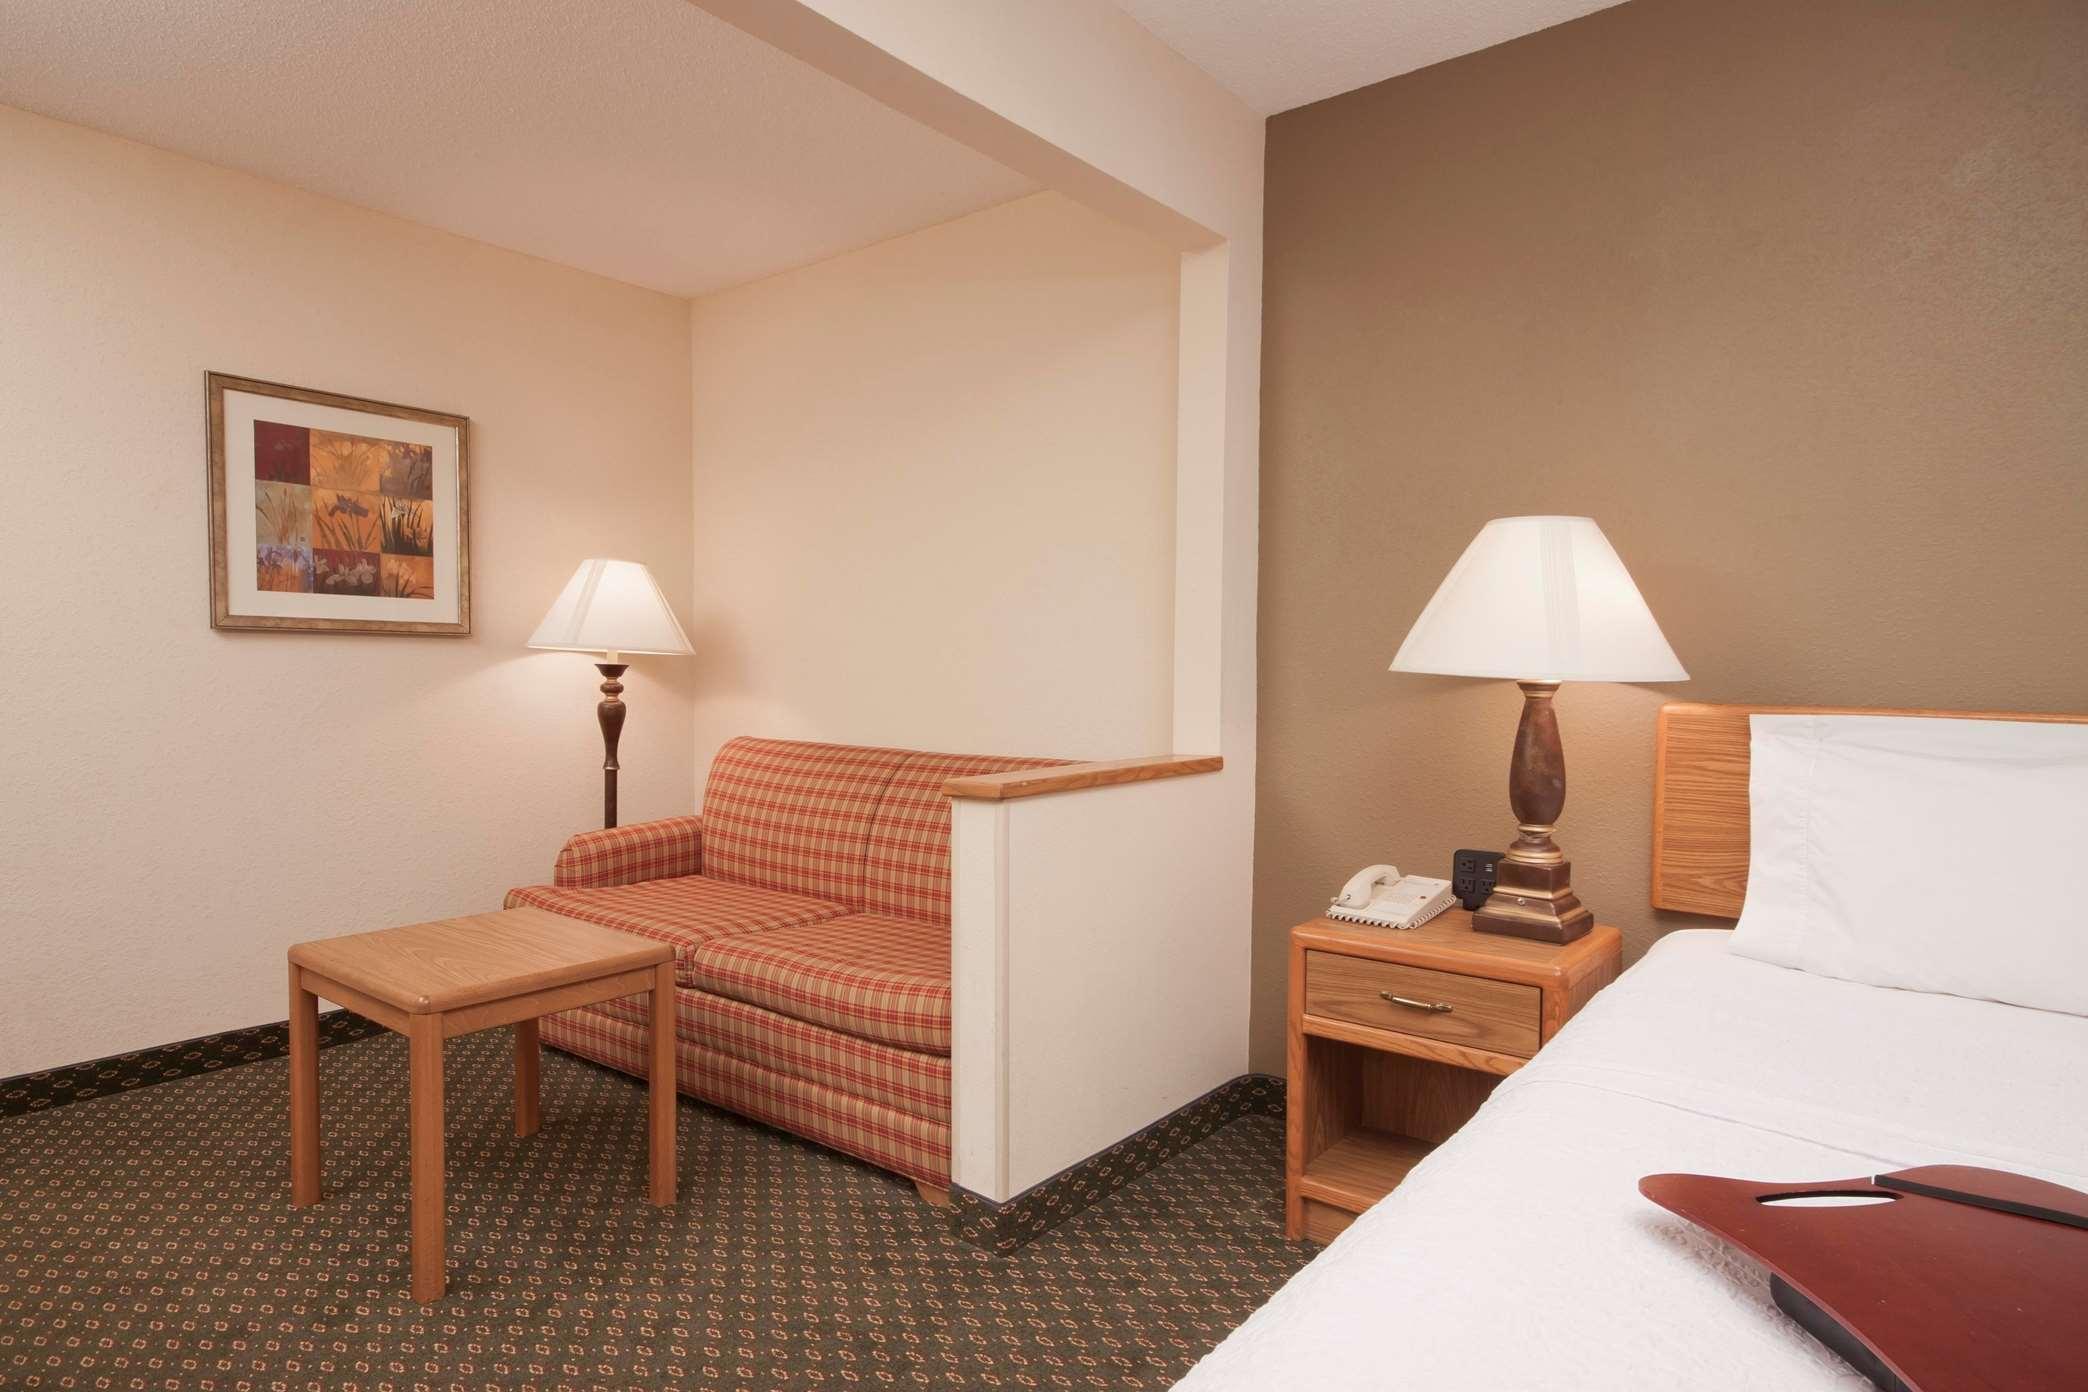 hotel room KXTY